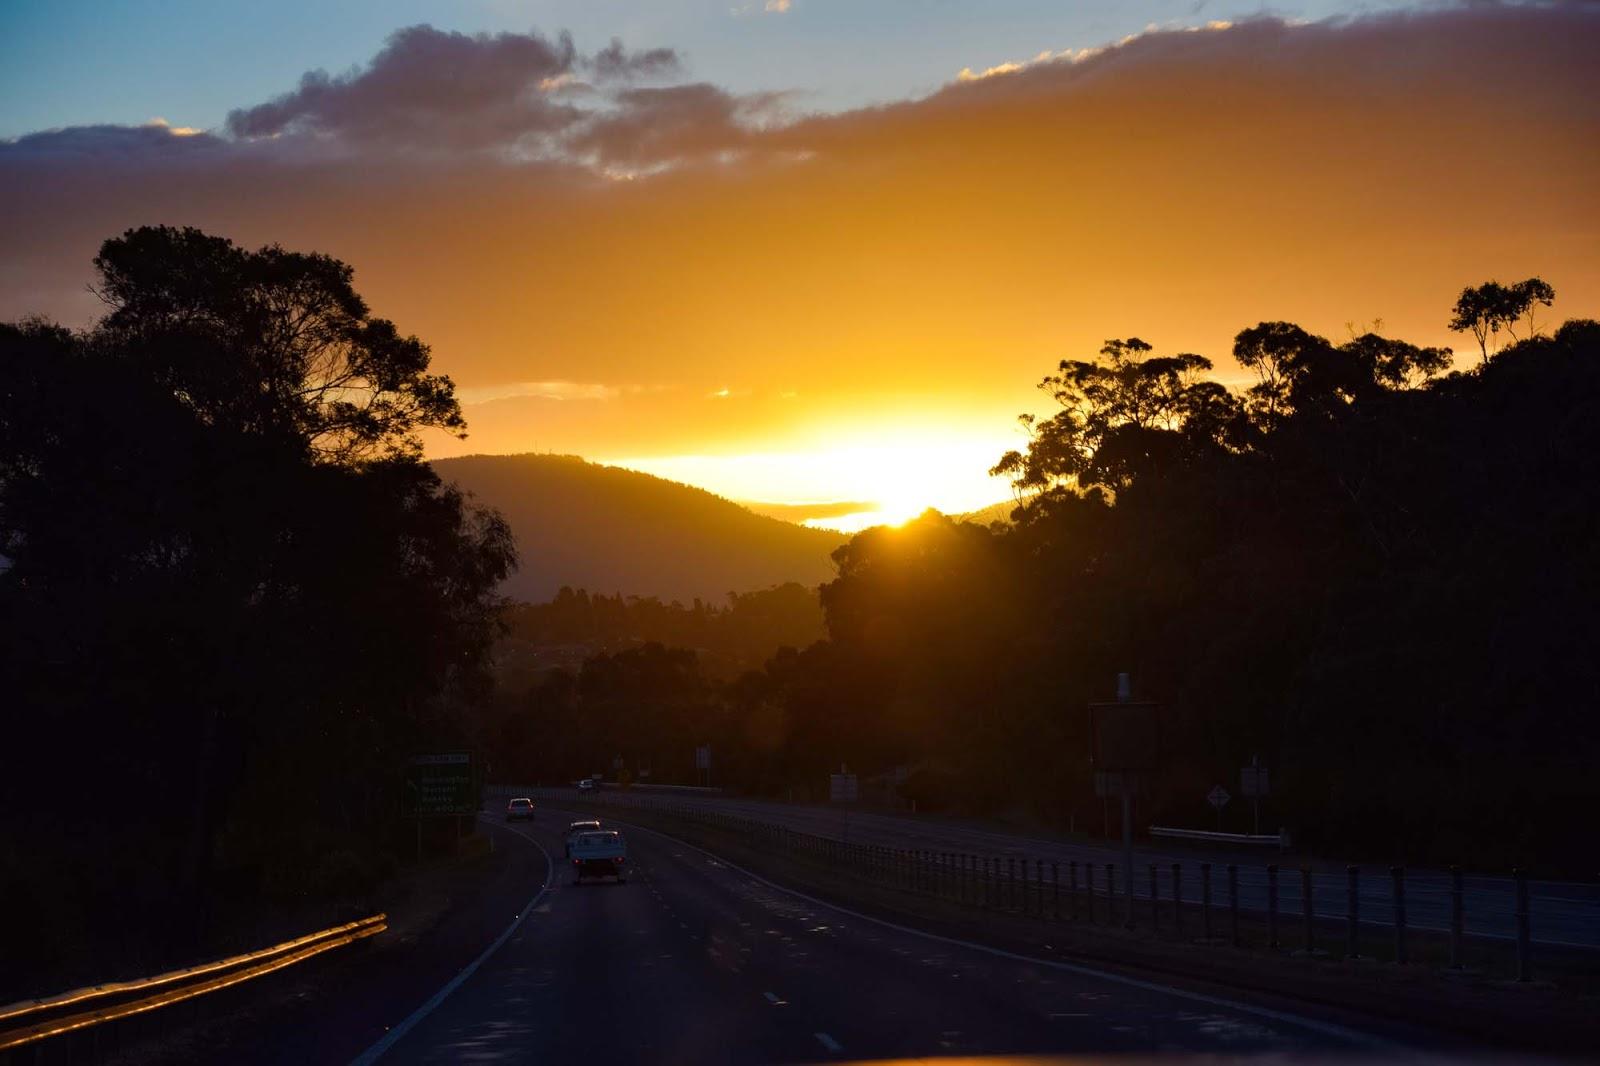 sunset in hobart